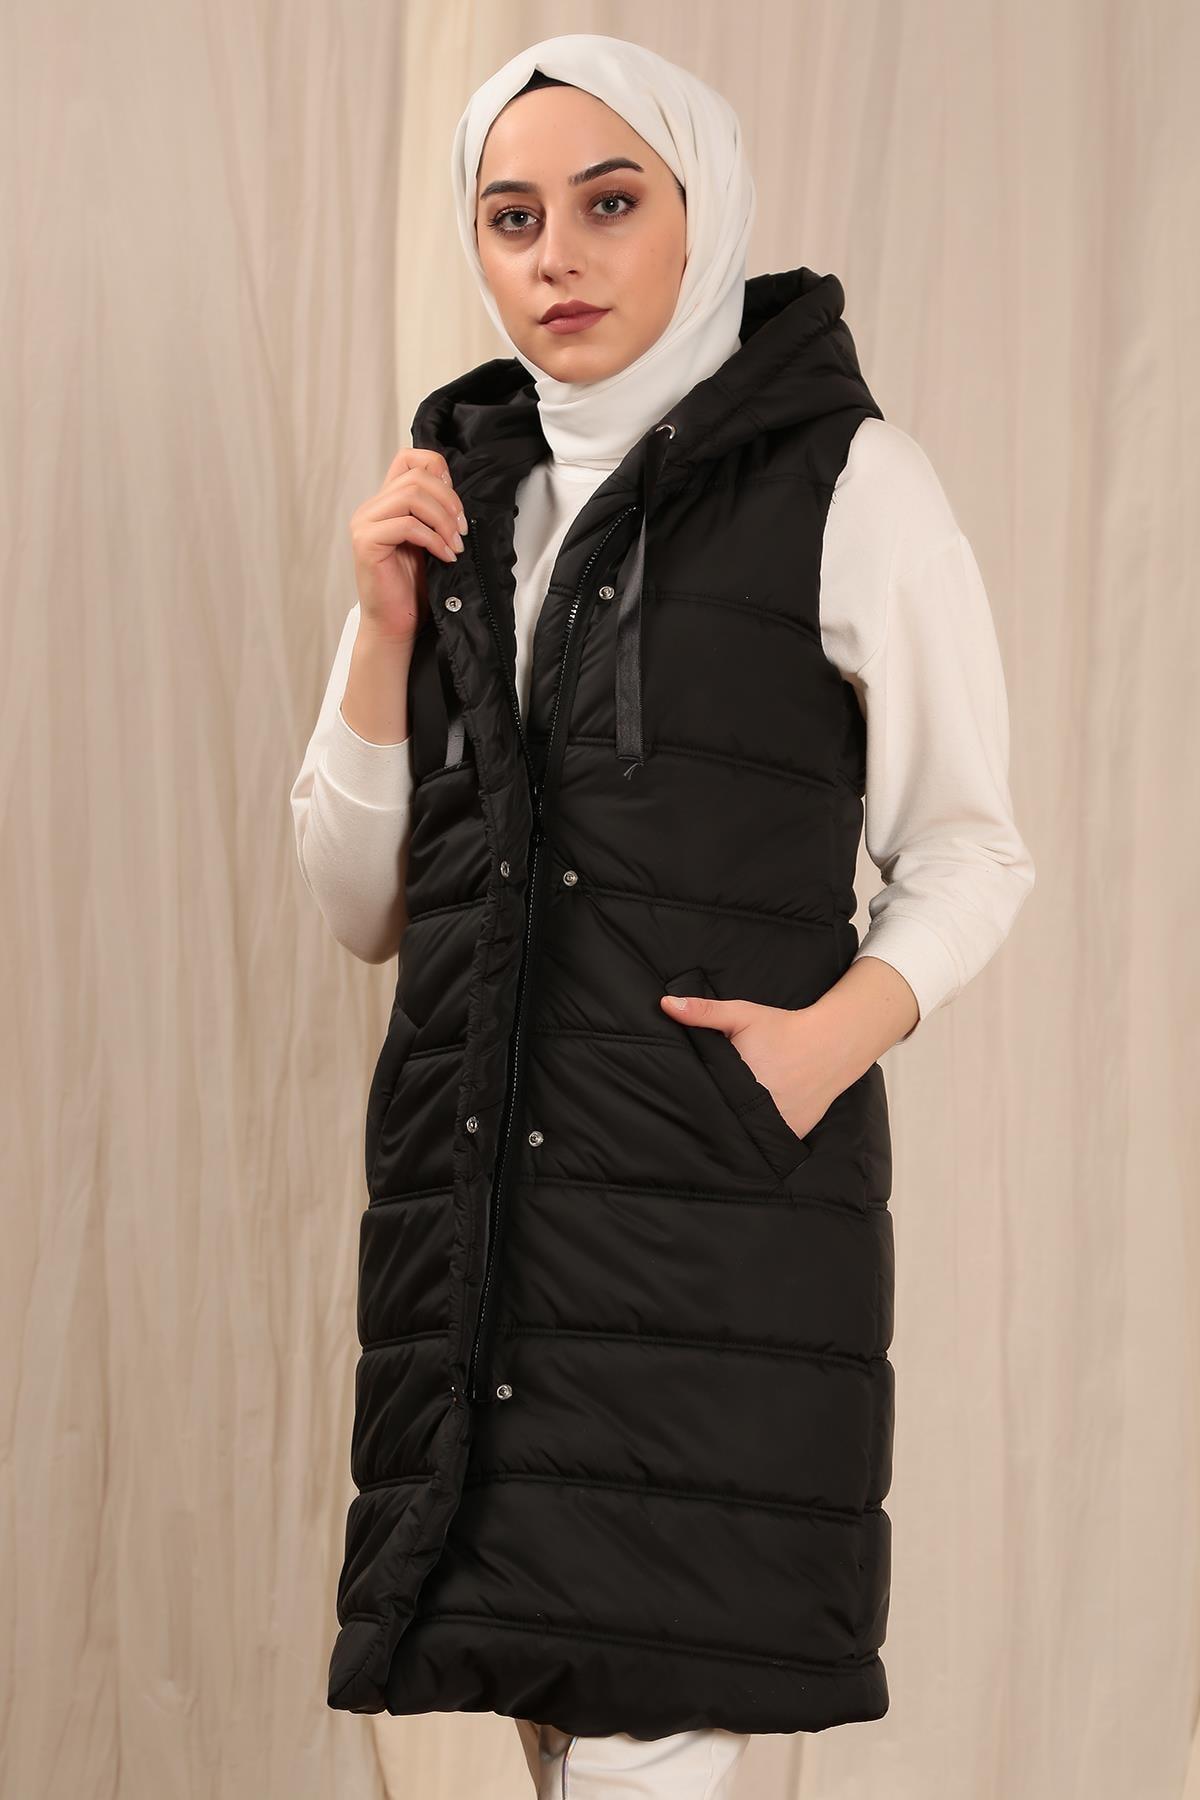 Ramadan Abaya Dubai Turkey Arabic Muslim Hijab Dress Kaftan Islam Hooded Ribbed Zippered Snap-Fast Inflatable Vest